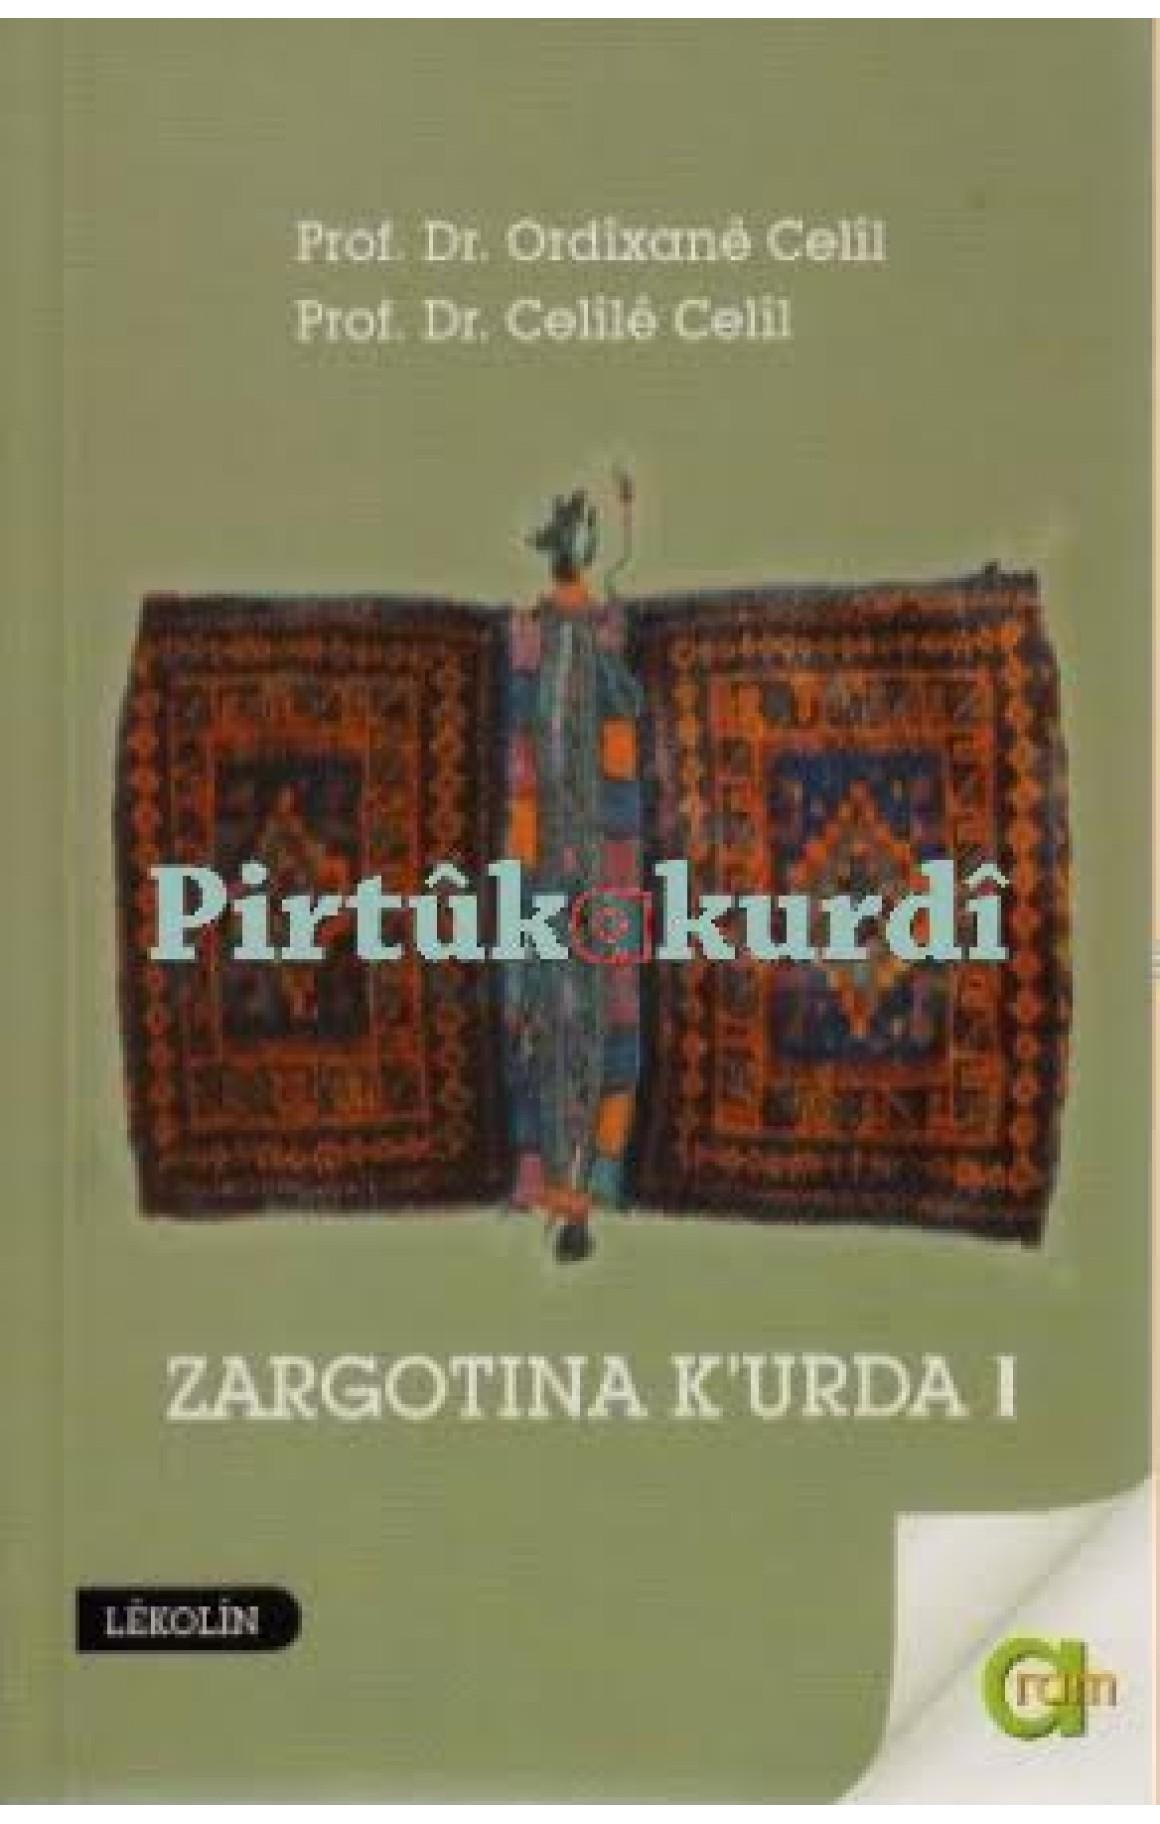 Zargotına Kurda